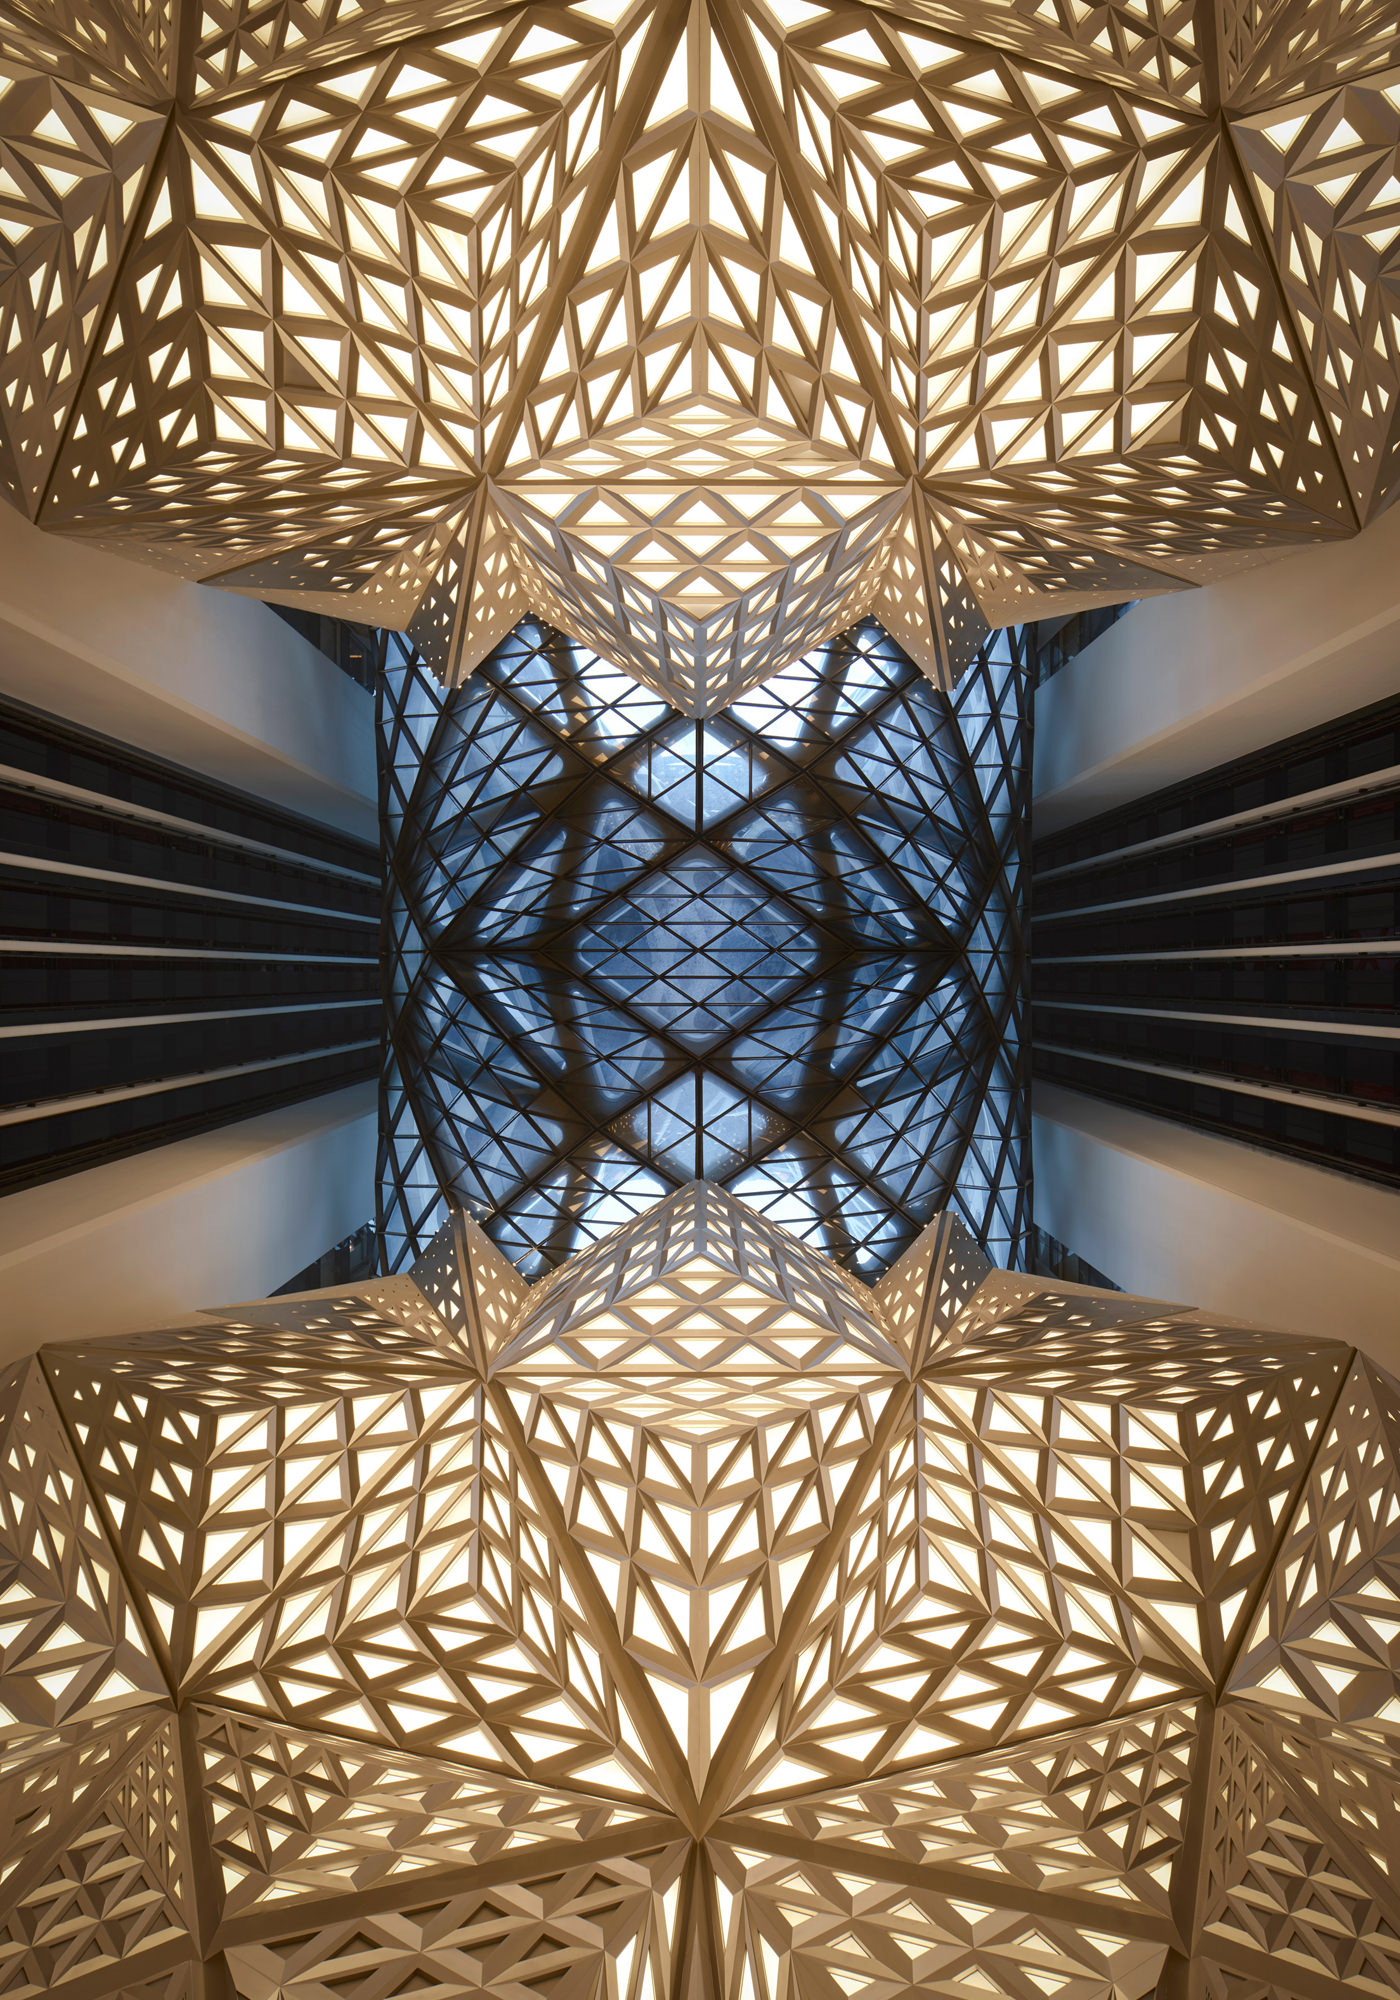 City Guide Macao Chine Morpheus Hotel Zaha Hadid Architects